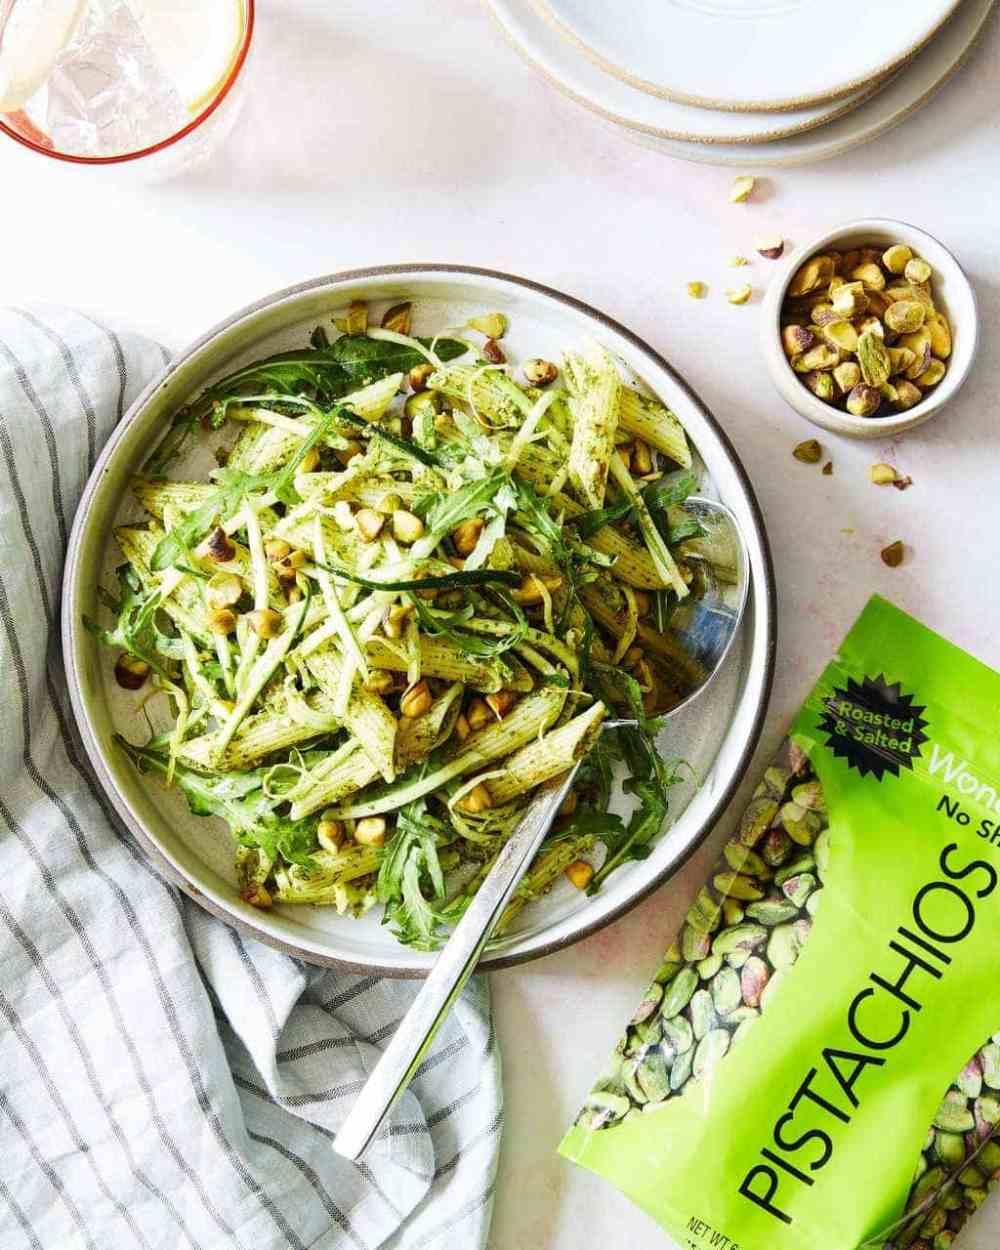 Bowl of pistachio pesto pasta with bag of green pistachios